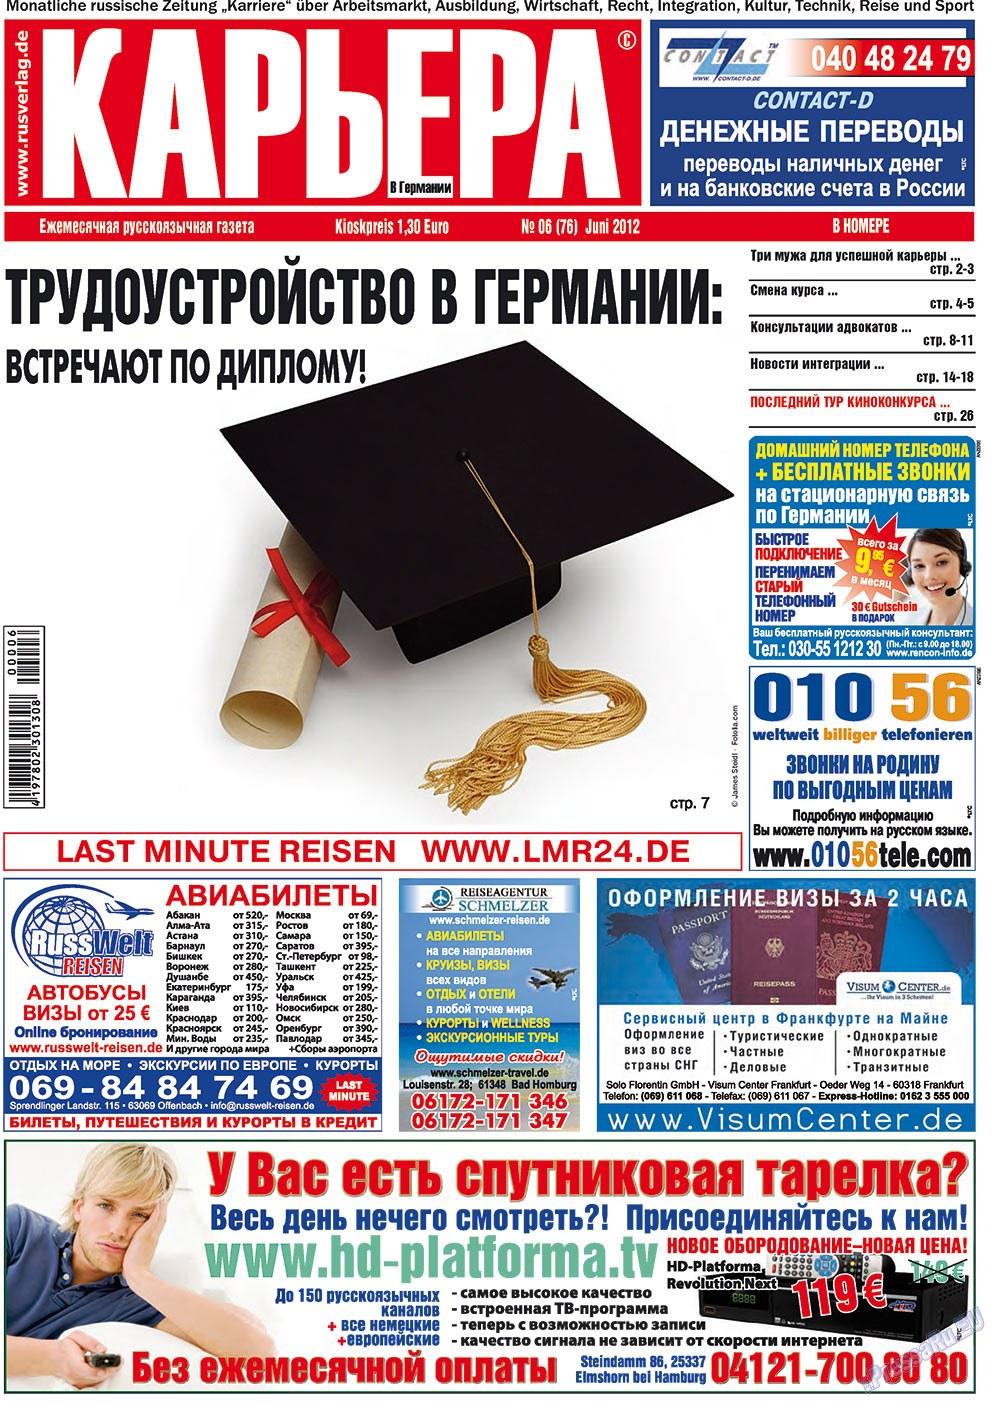 Карьера (газета). 2012 год, номер 6, стр. 1